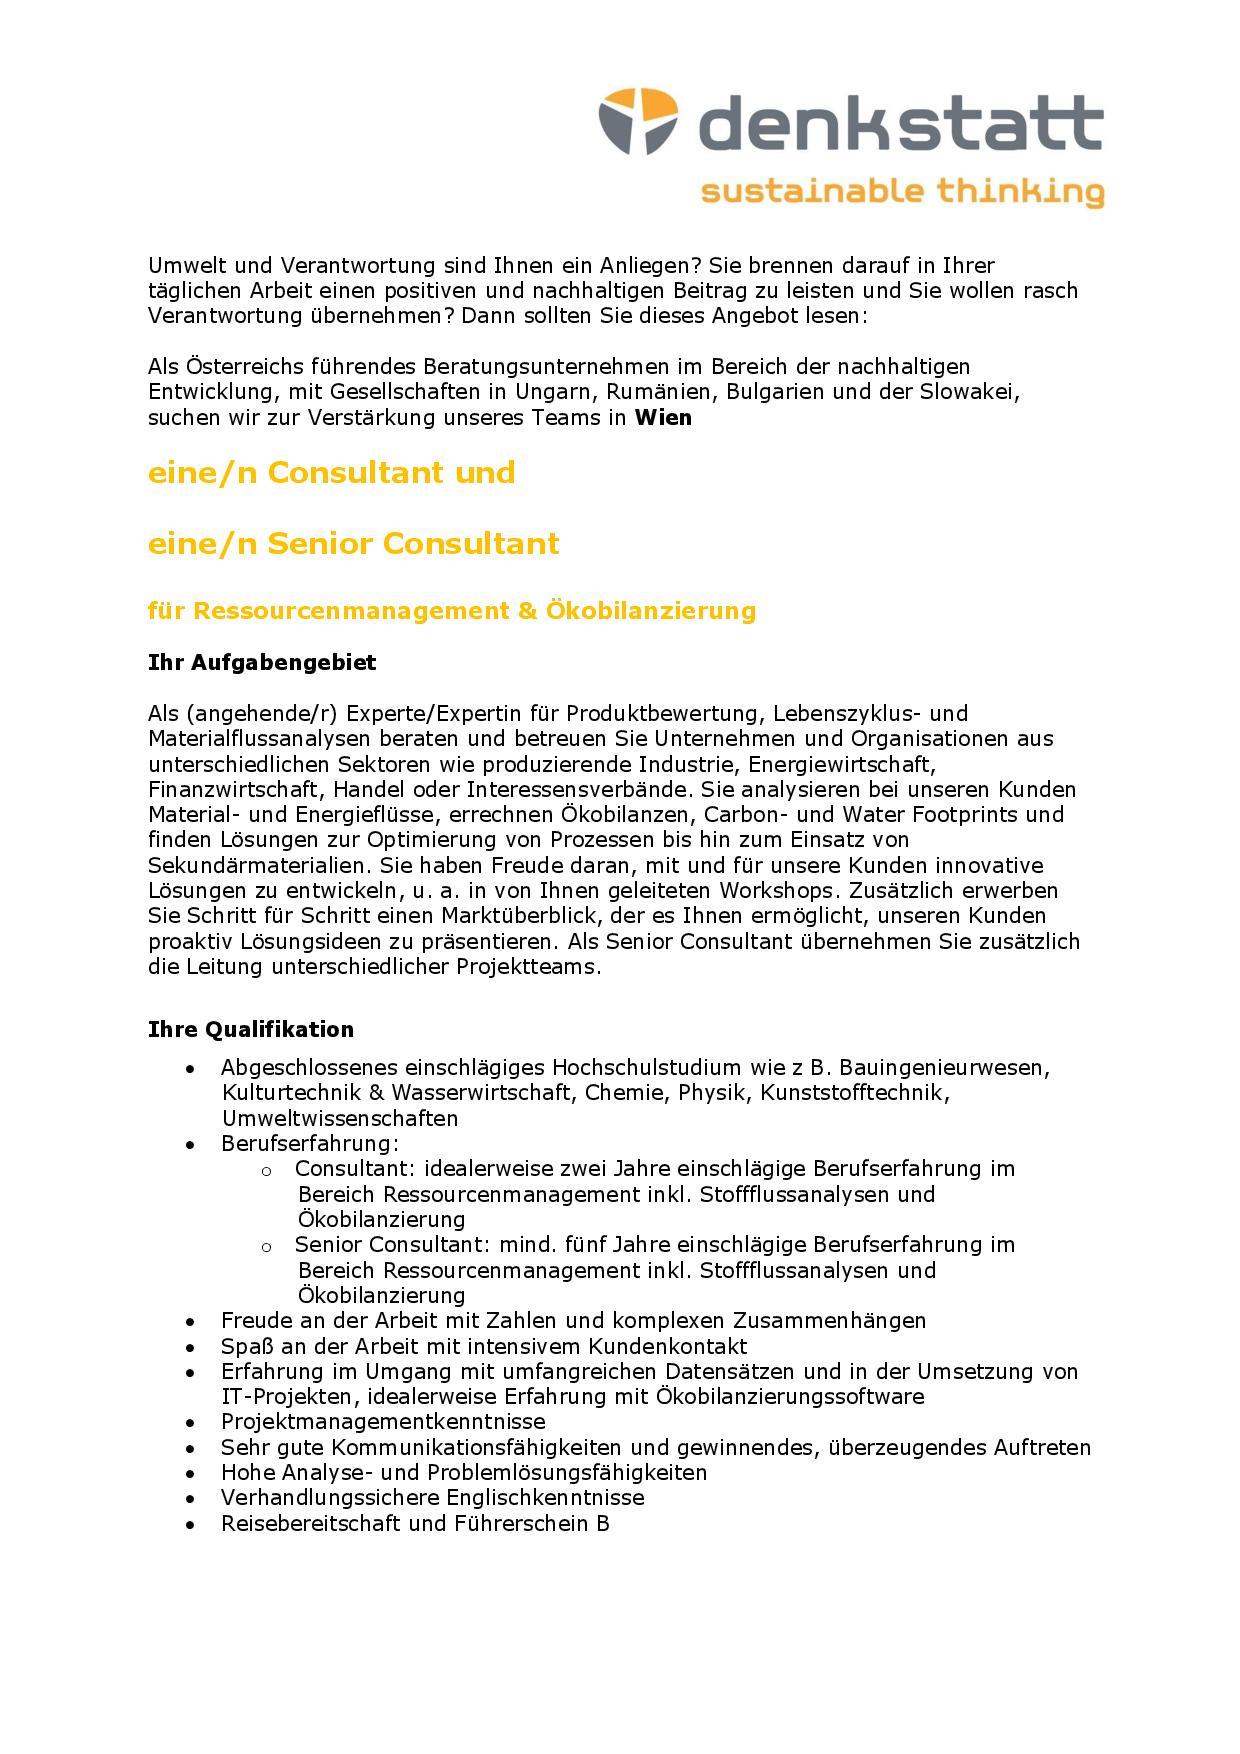 Job_ressourcenmanagement